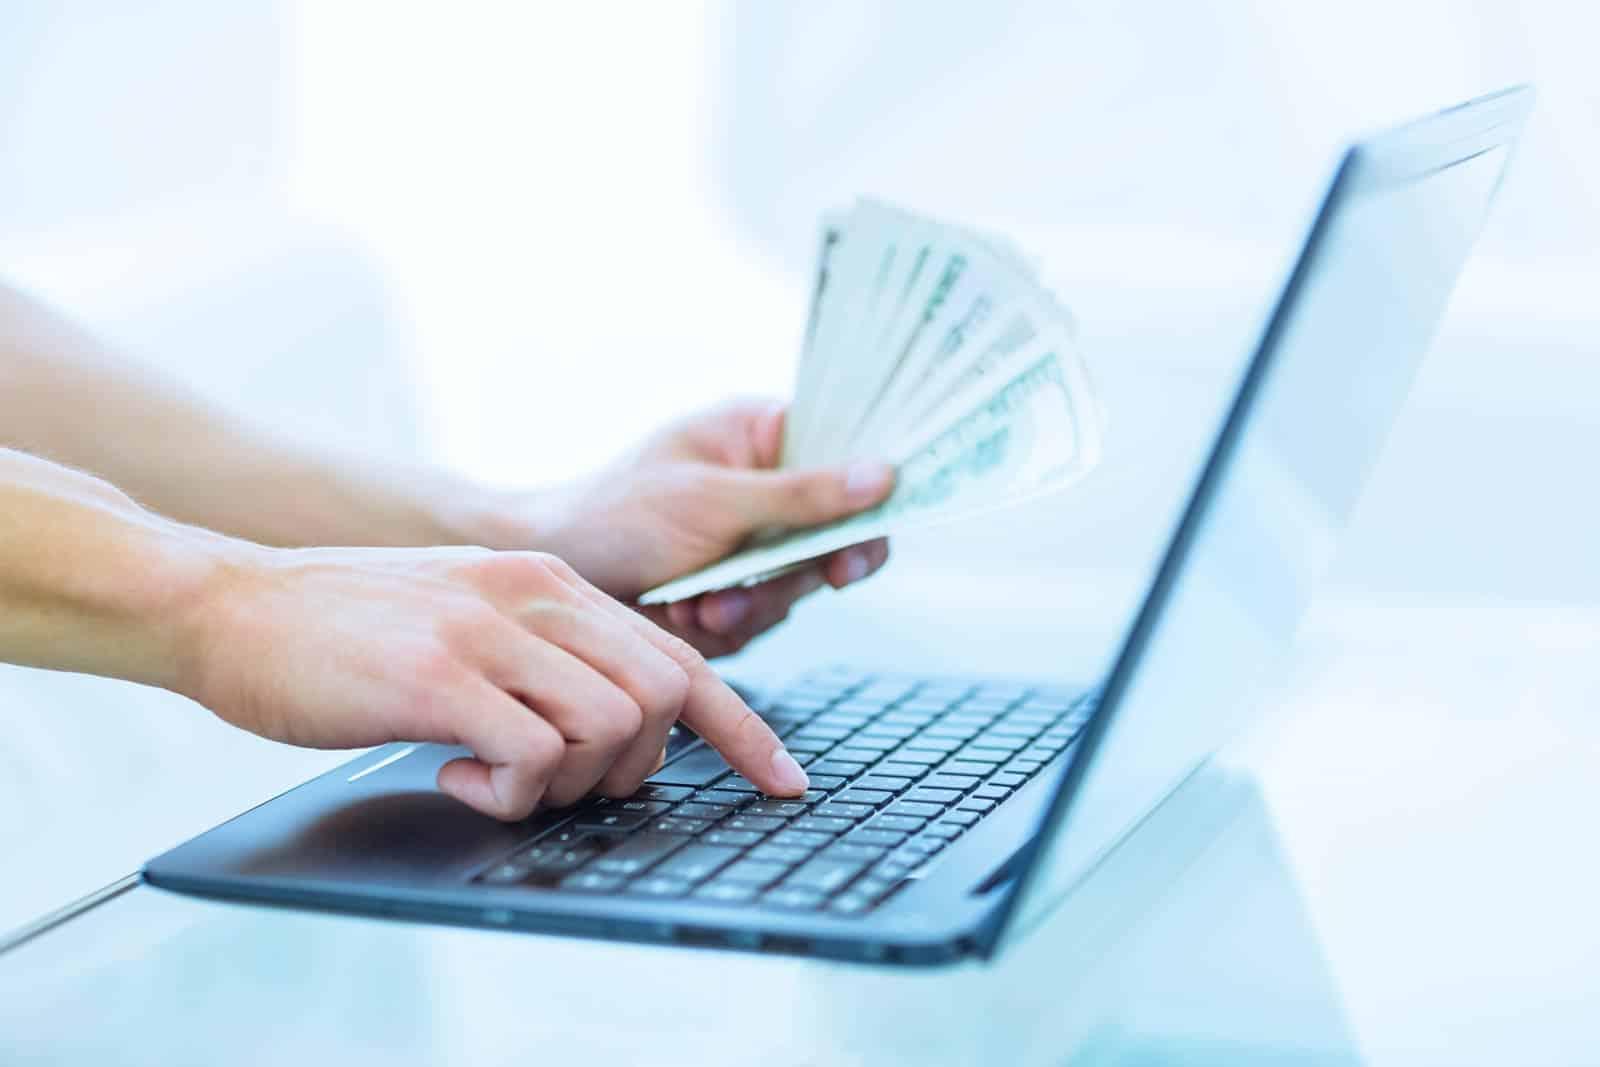 Brzi online zajmovi